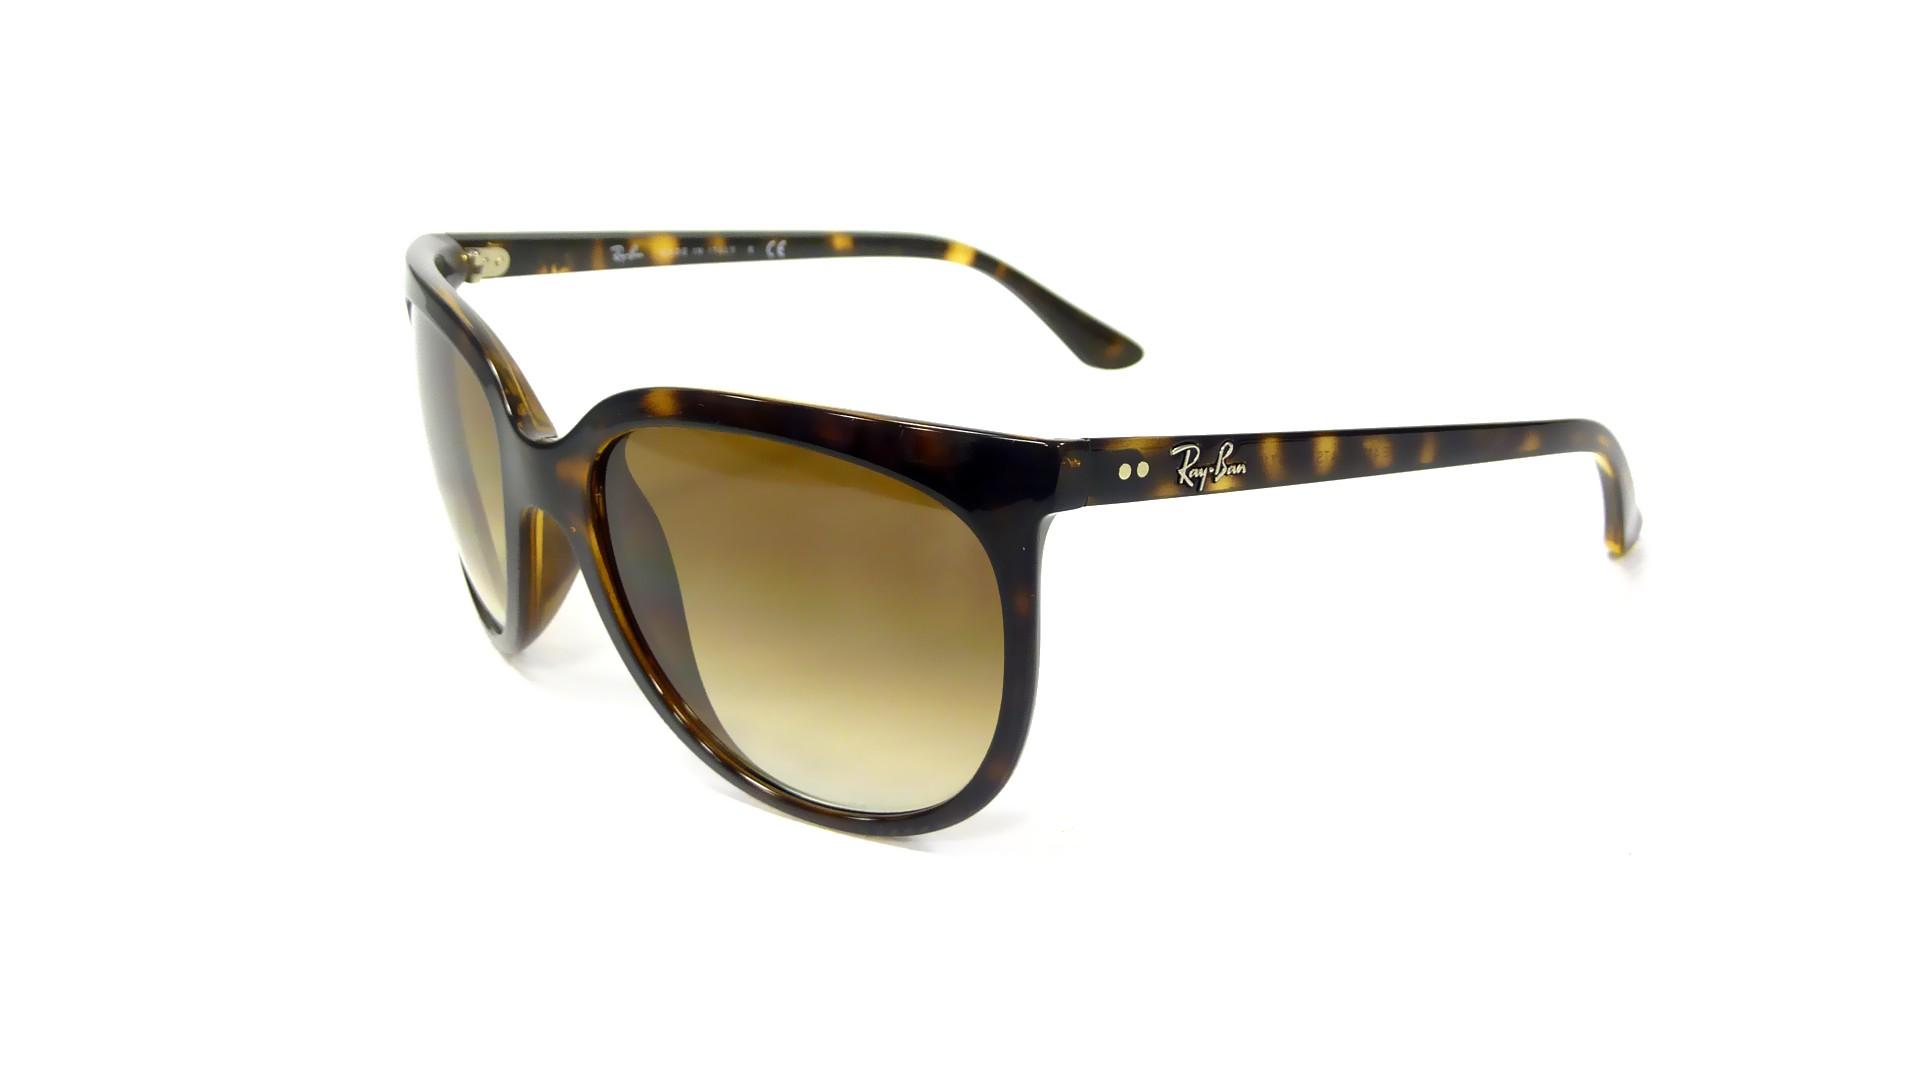 f03d5480e18b1c Sunglasses Ray-Ban Cats 1000 Tortoise RB4126 710 51 57-20 Large Gradient